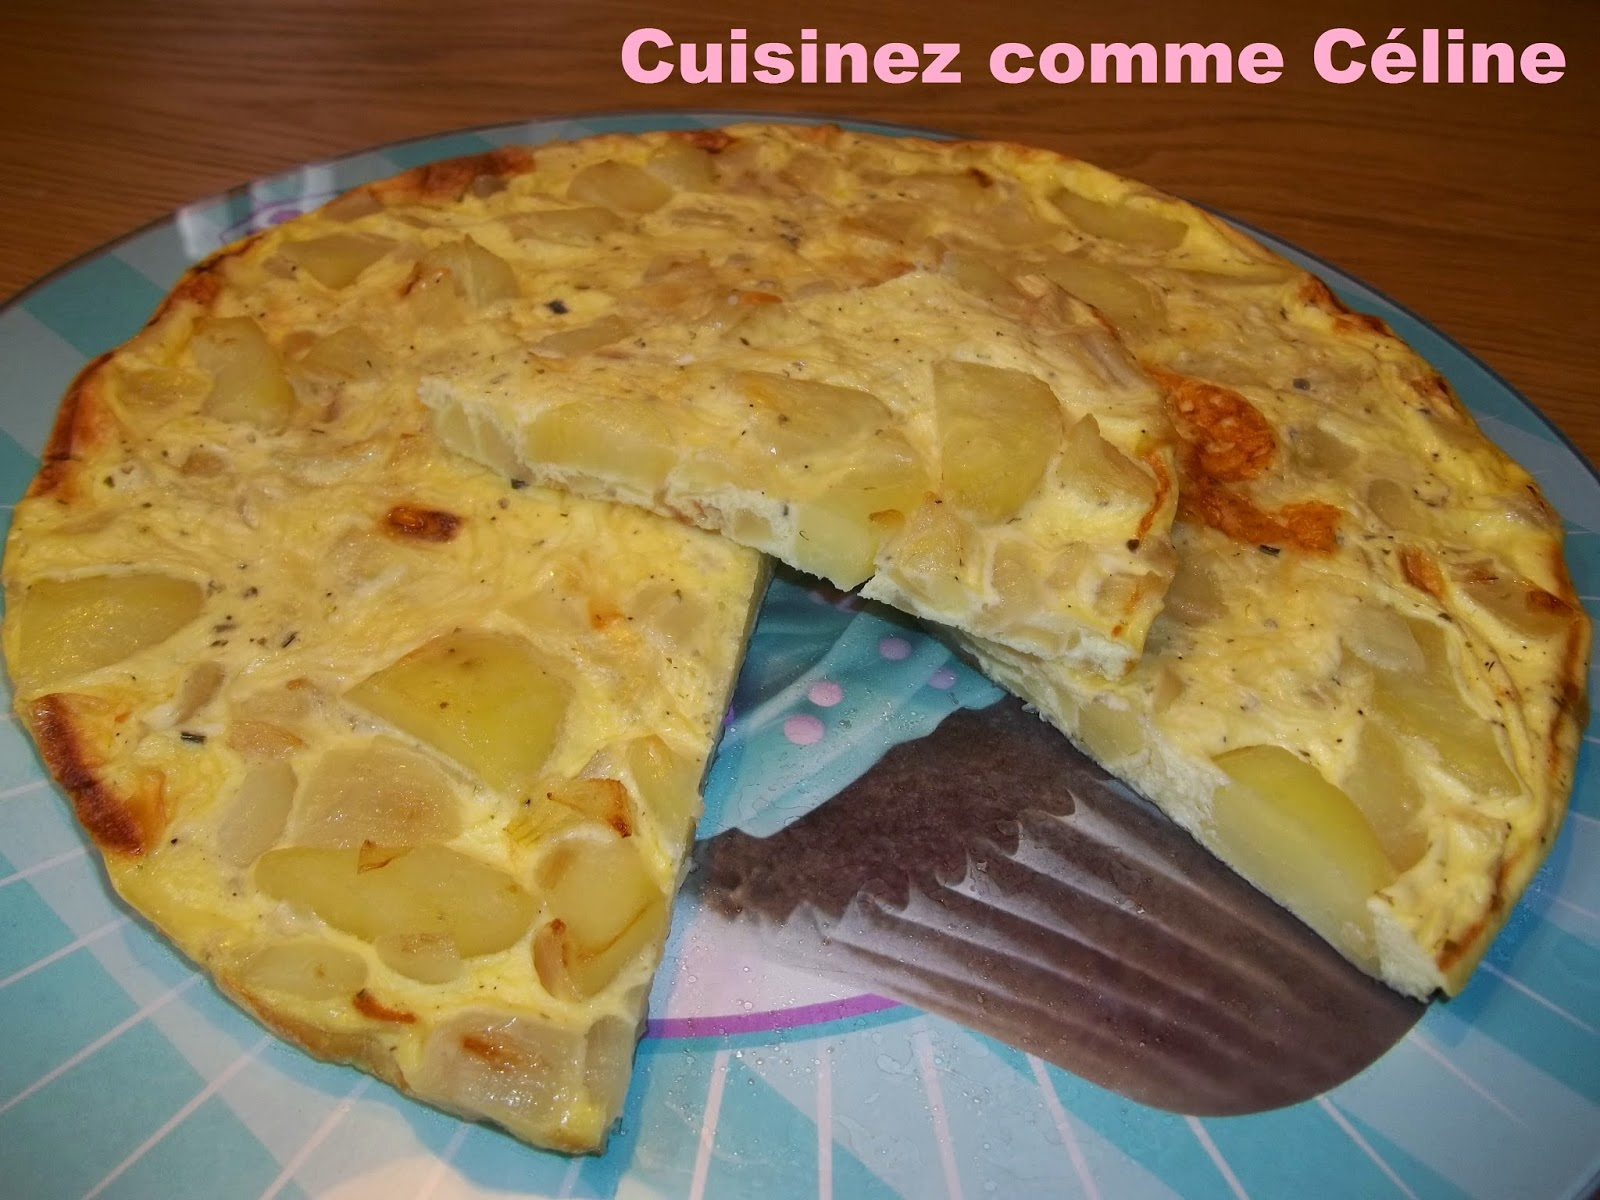 http://cuisinezcommeceline.blogspot.fr/2015/02/tarte-fine-sans-pate-oignon-pomme-de.html